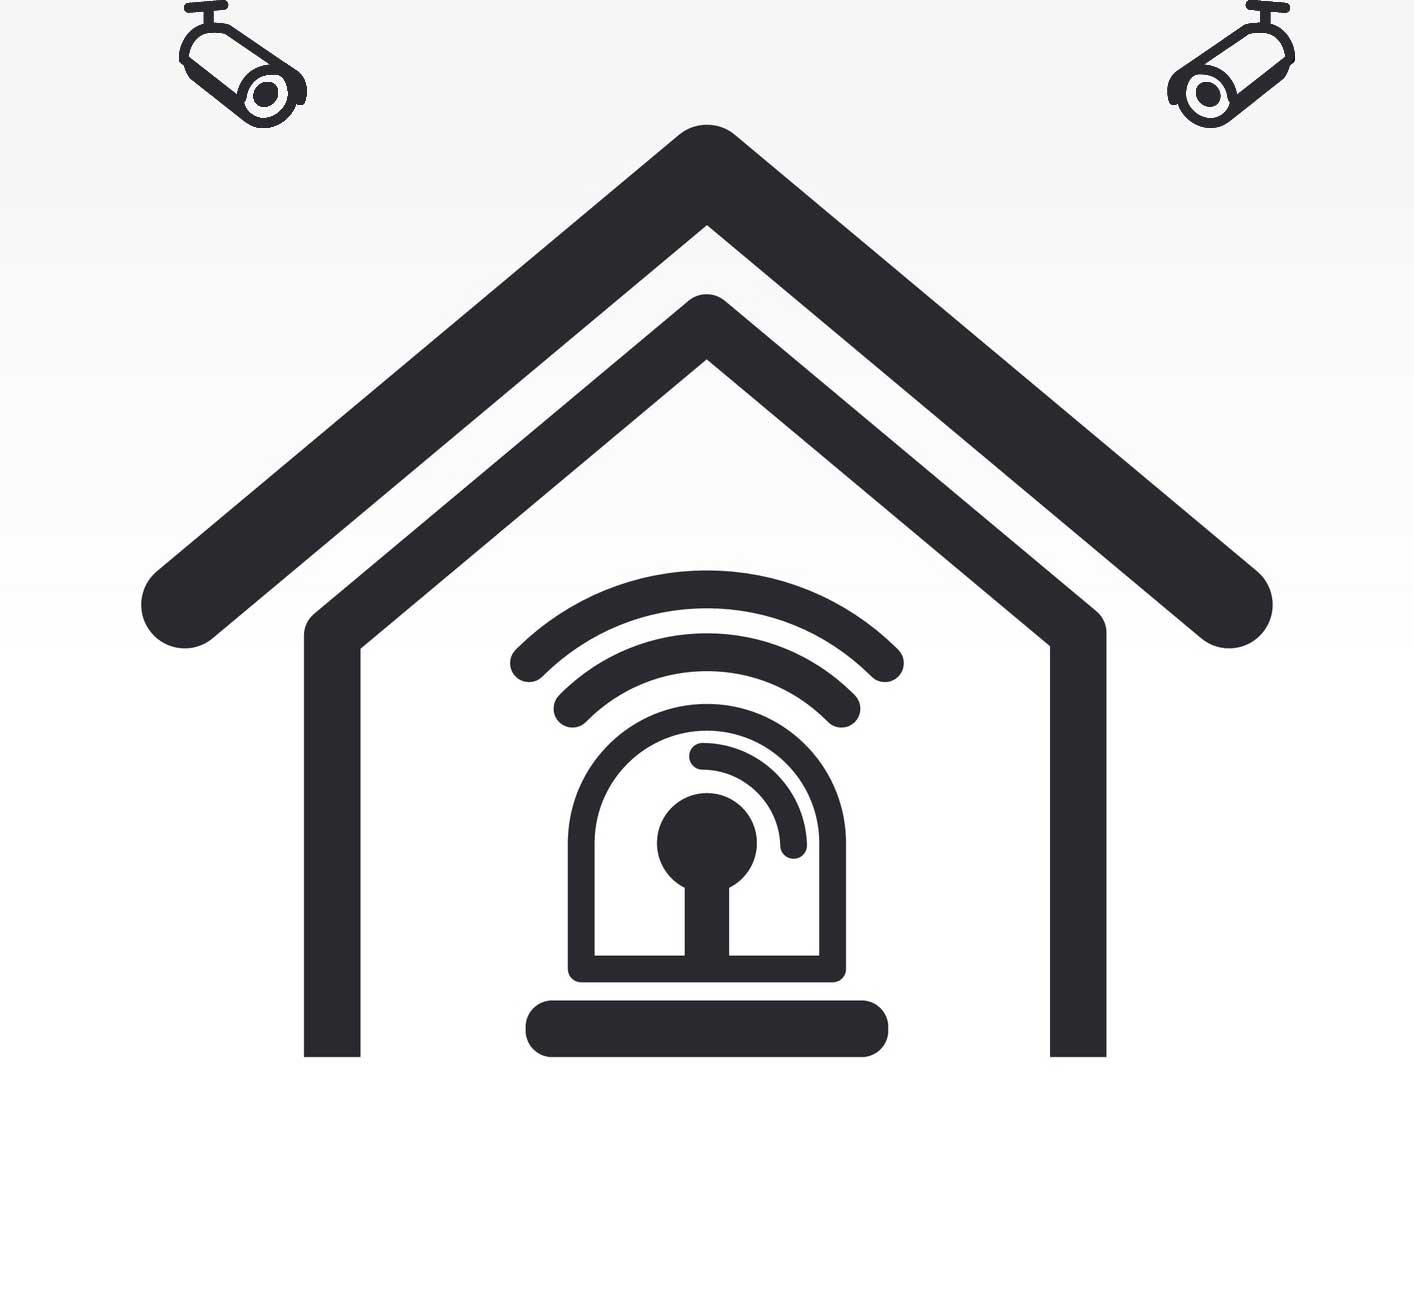 alarmas para hogar viajeros